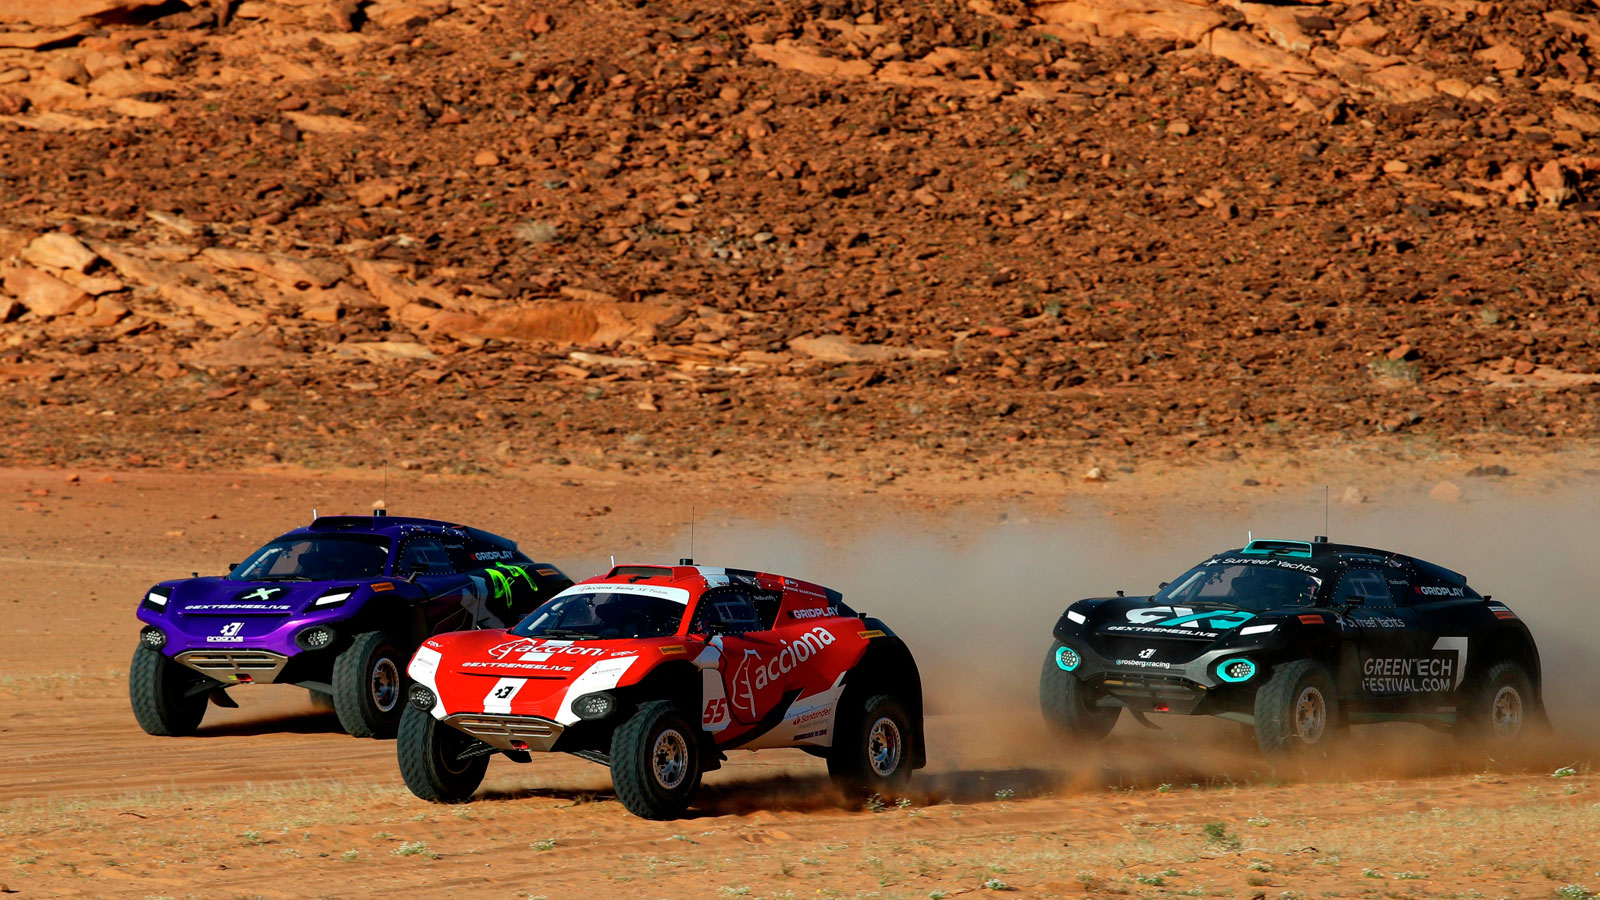 EV racing vehicles